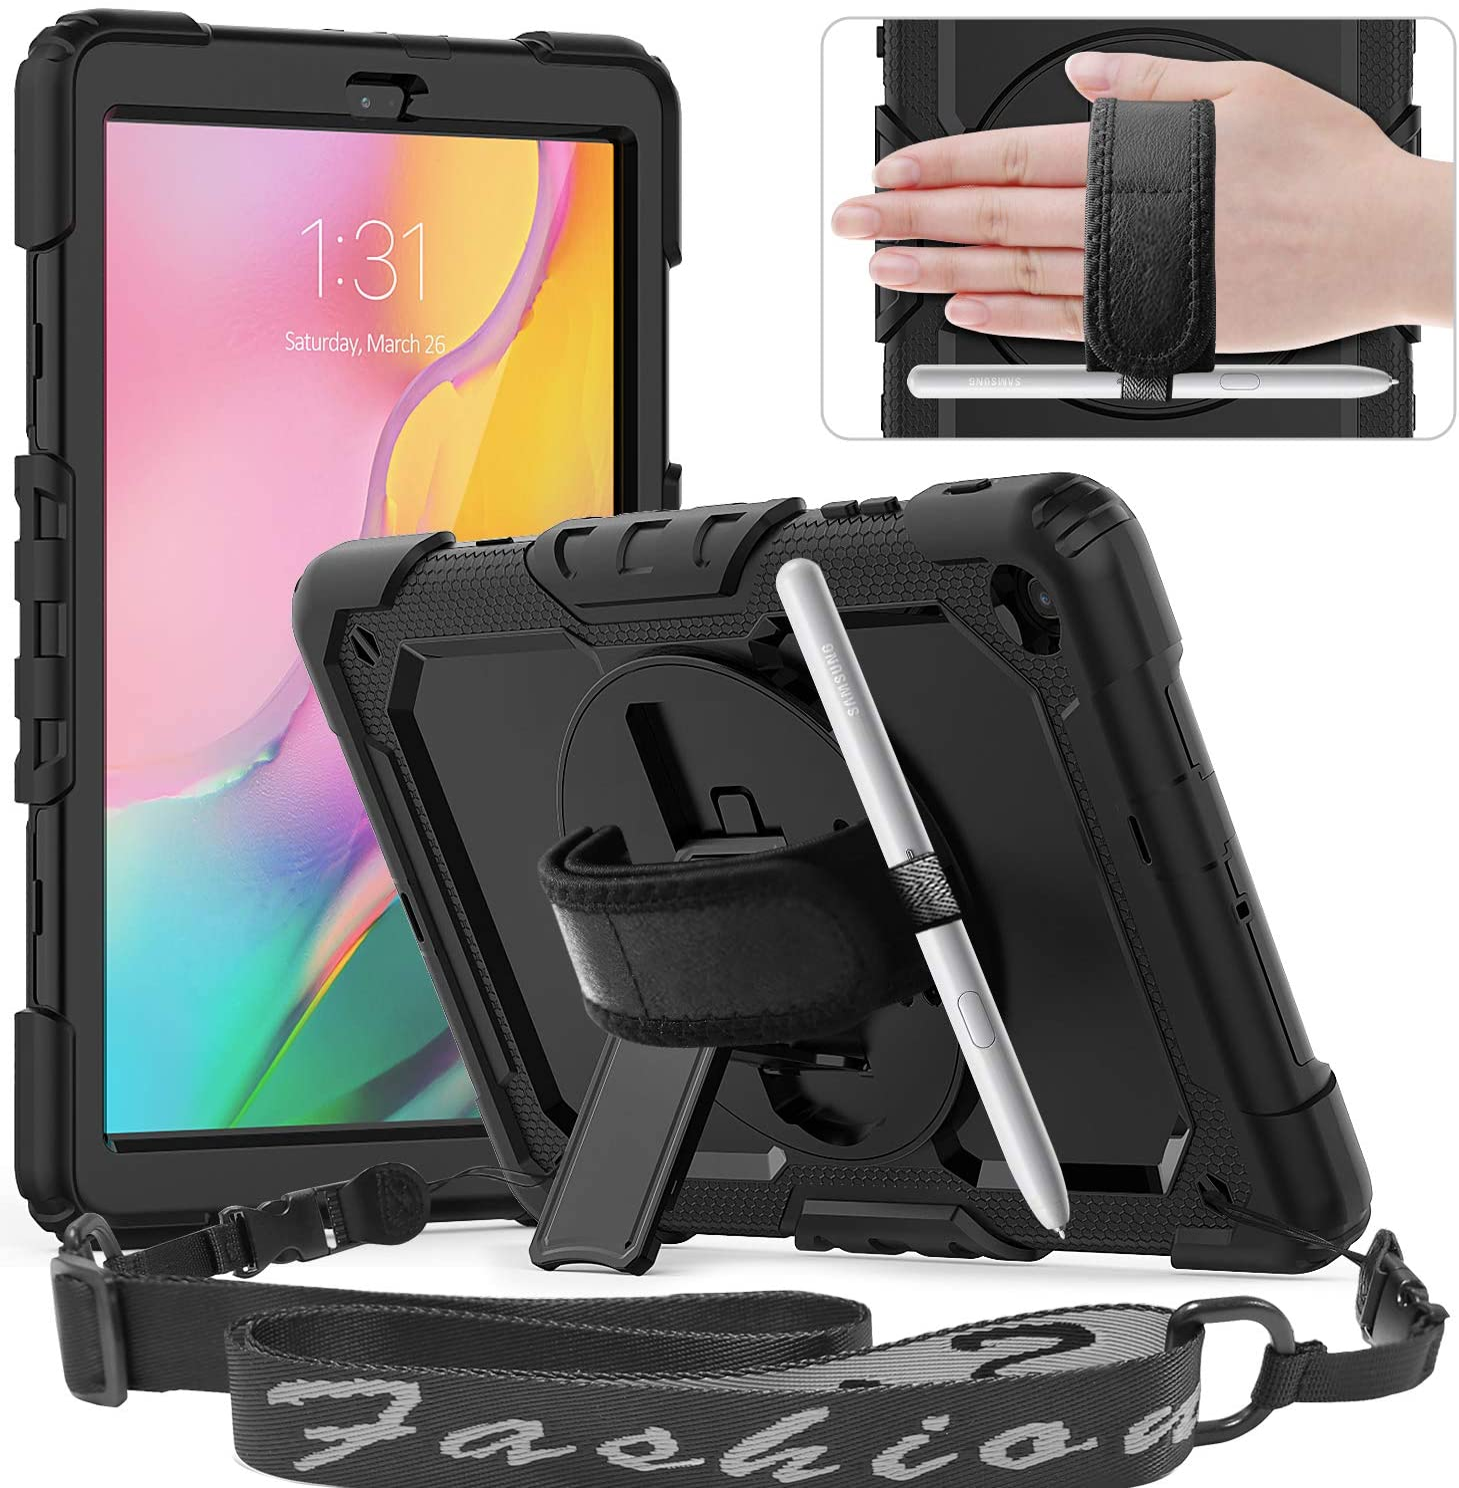 Funda Timecity para Galaxy Tab A 10.1 2019 SM-T510...-6M2H